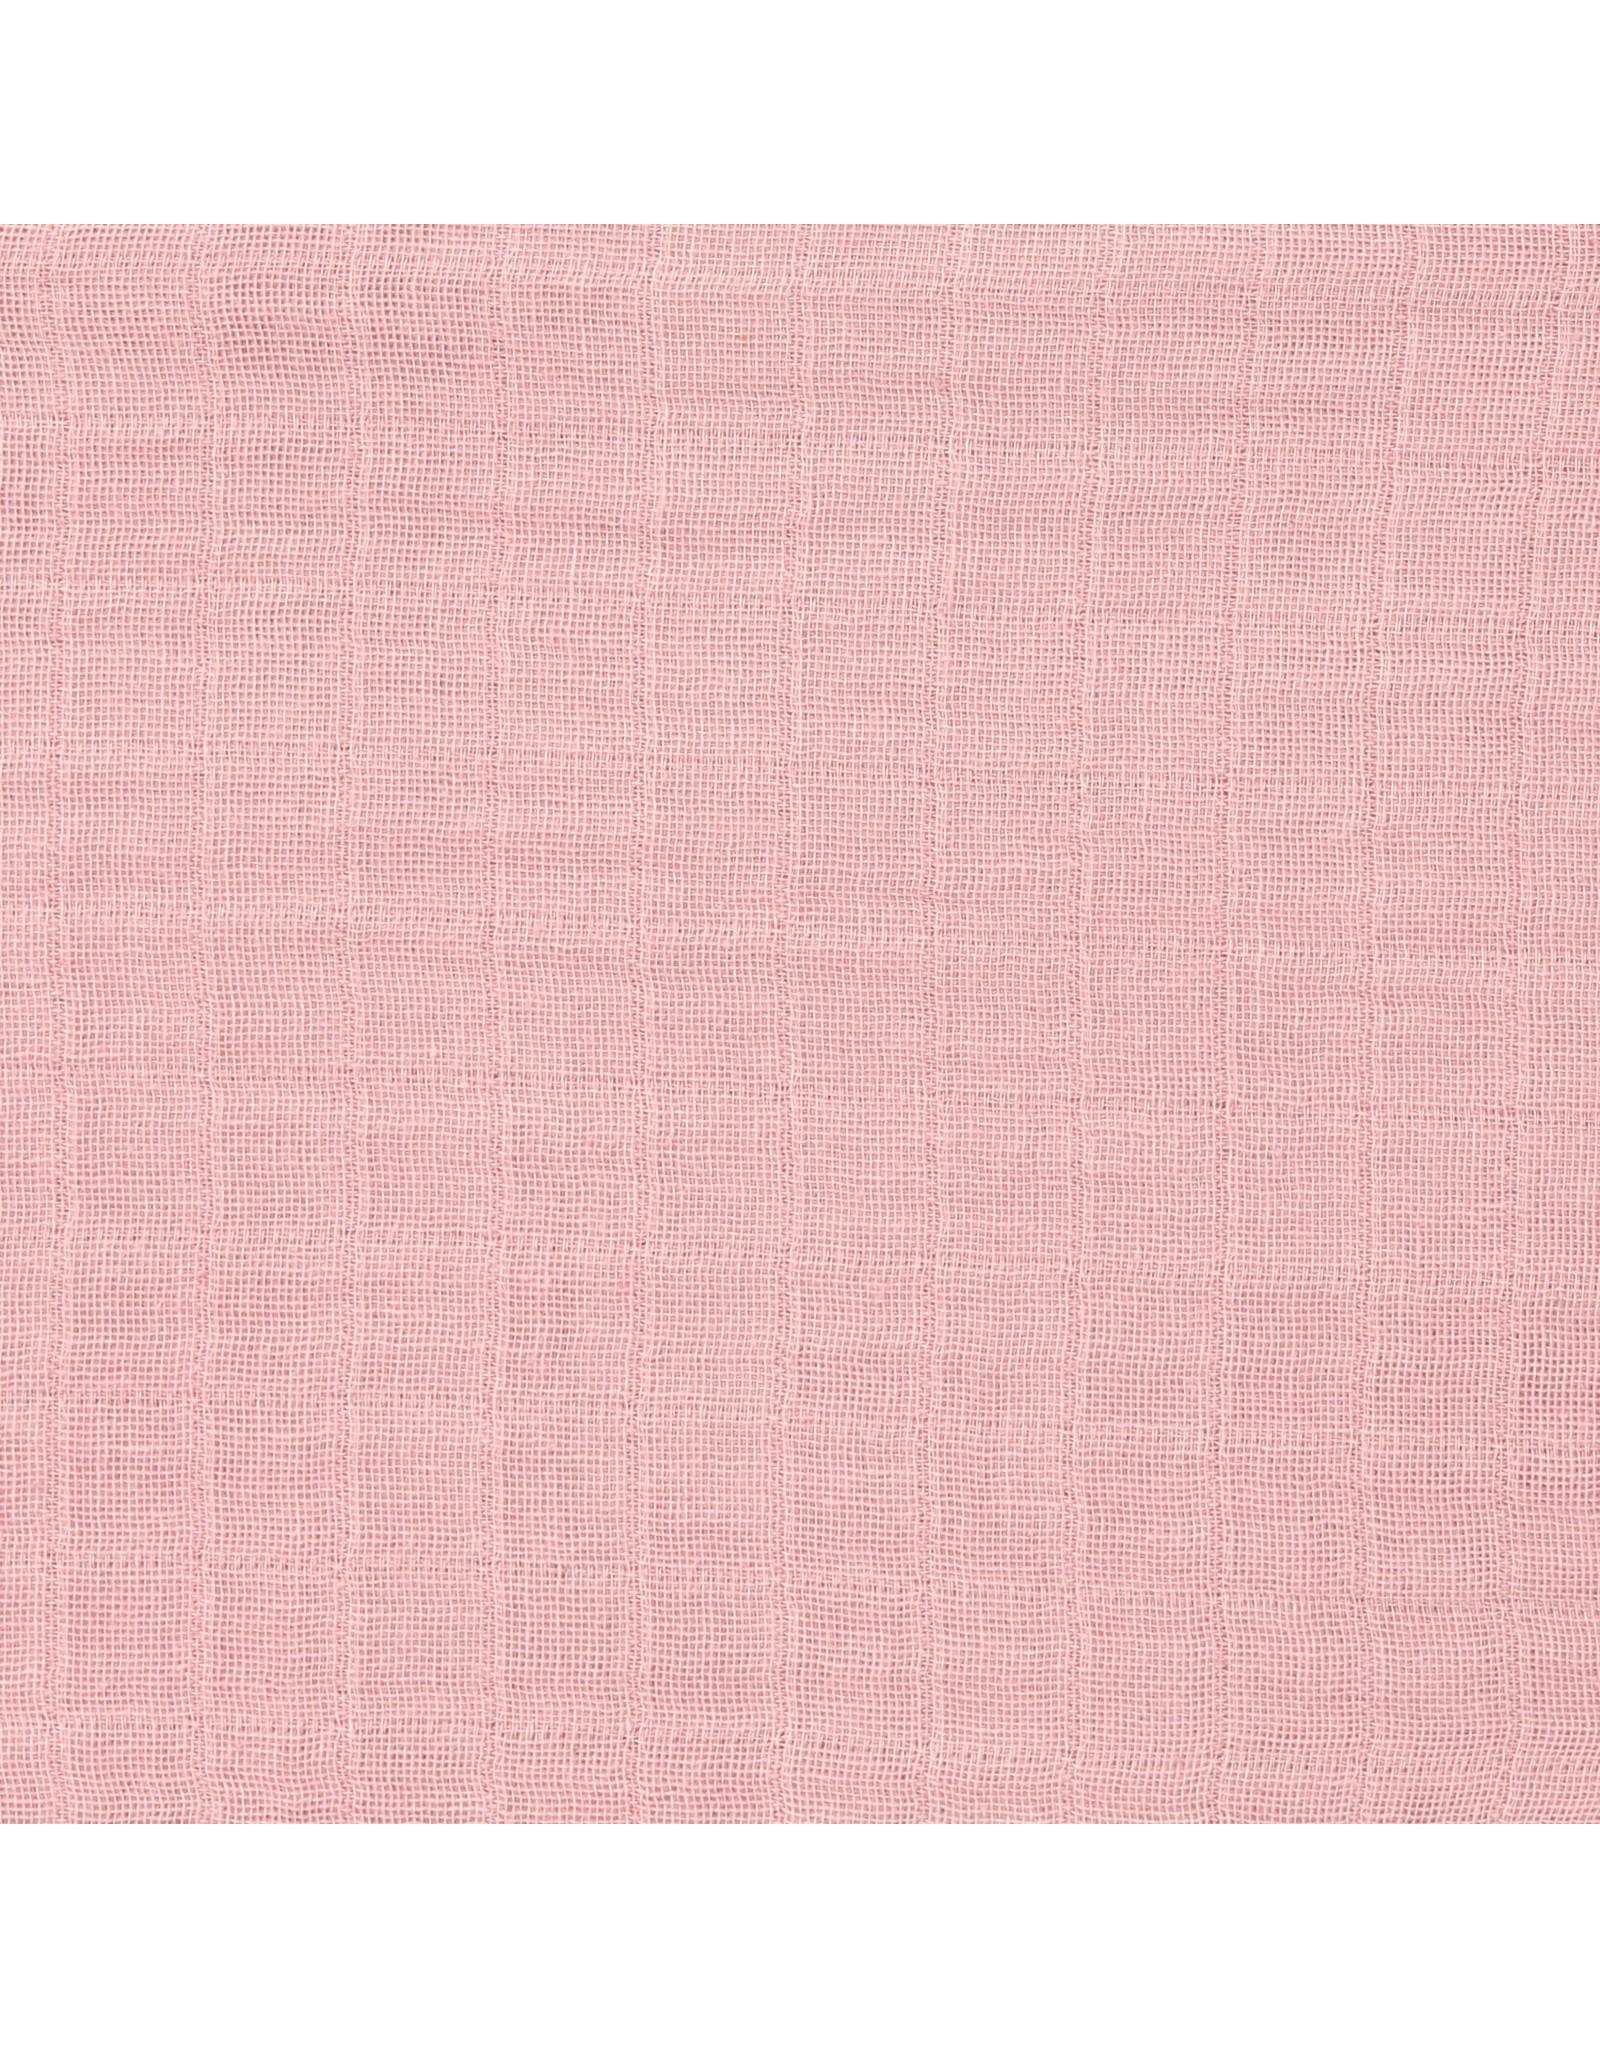 Lassig Lassig Swaddle & Burp Blancket L 3pcs 85x85 Rose/Rosewood/Mustard